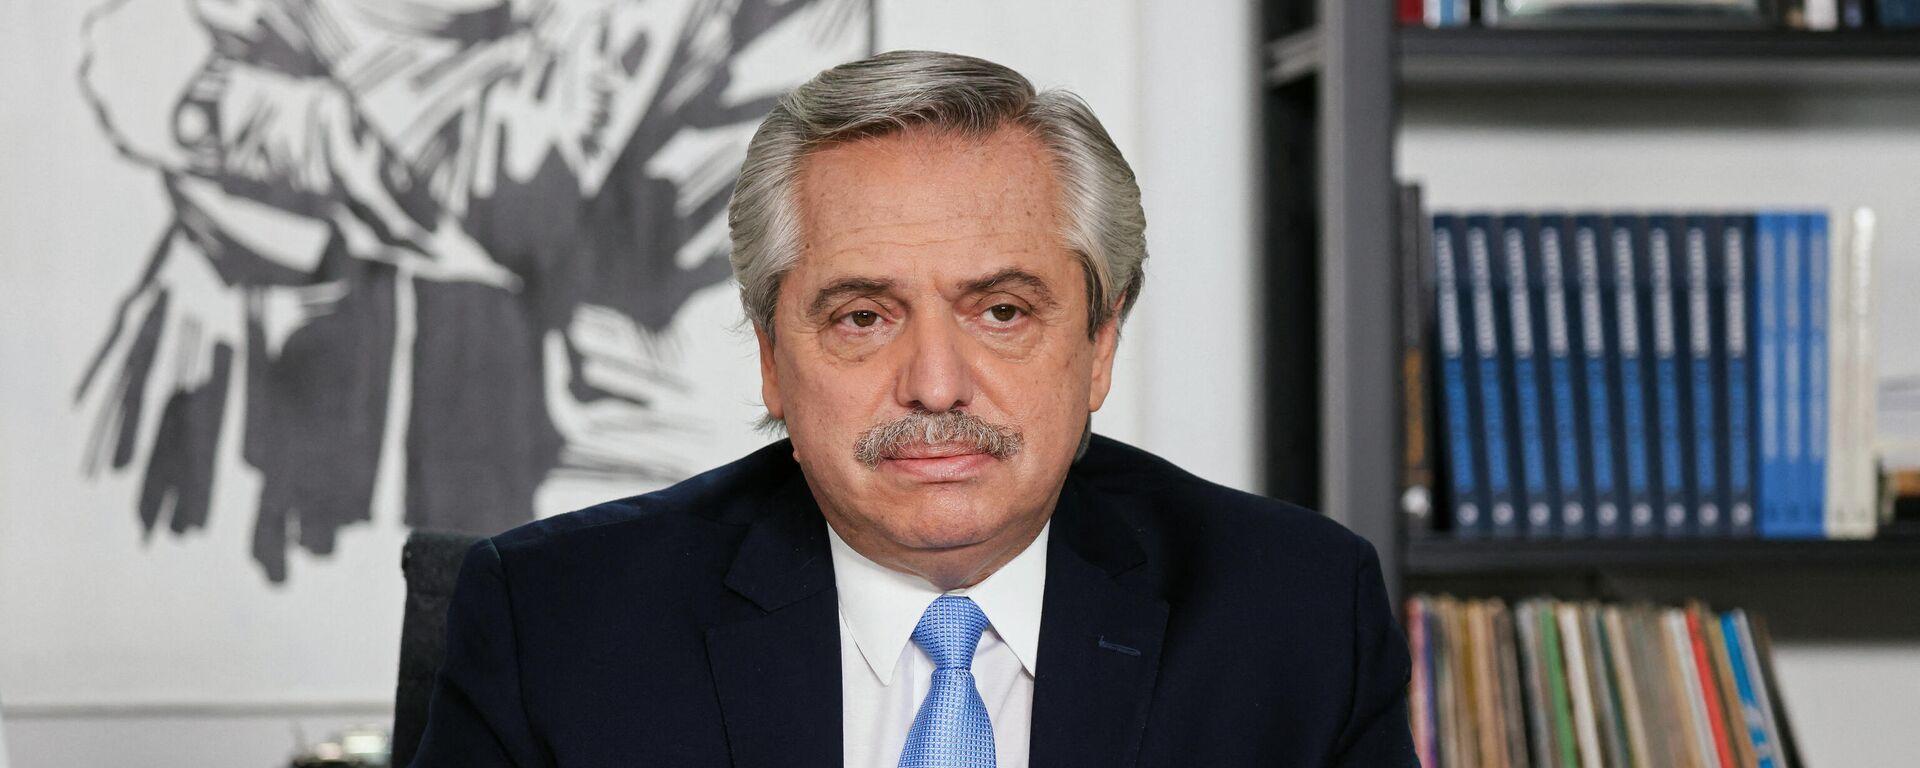 Alberto Fernández, presidente de Argentina - Sputnik Mundo, 1920, 07.05.2021